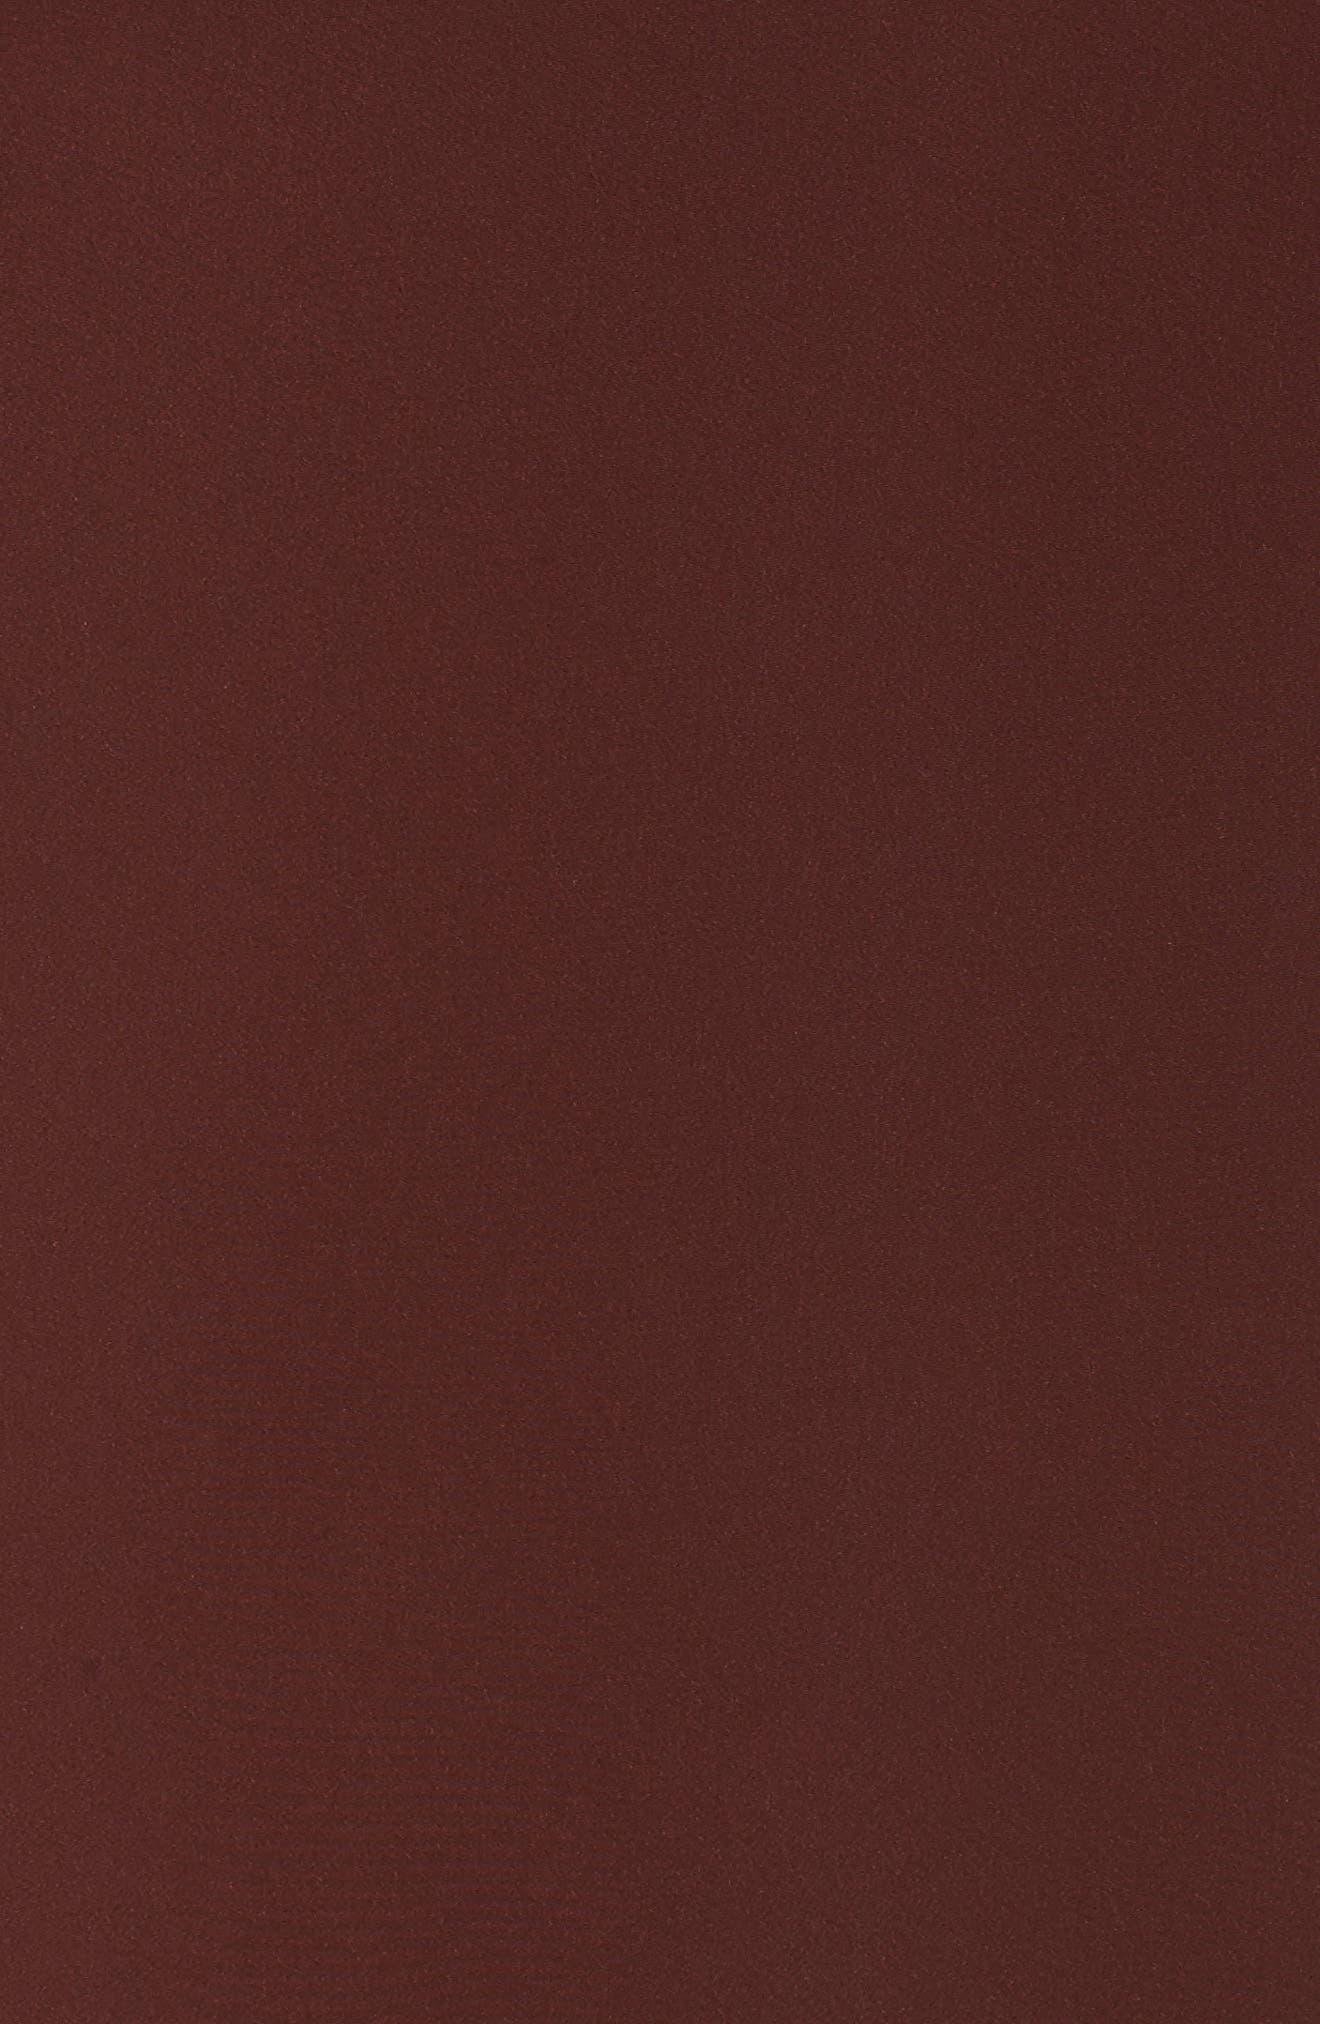 Bell Sleeve Blouse,                             Alternate thumbnail 9, color,